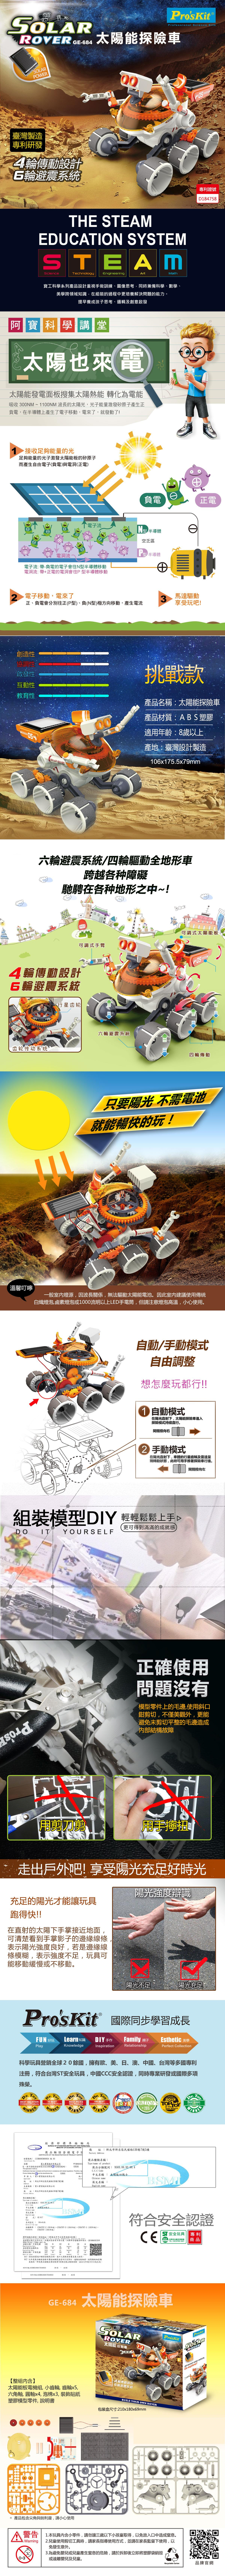 WIRED CONTROL ROBOT ARM & SOLAR ROVER 太陽能探險車,4輪傳動設計,6輪避震系統,ABS塑膠,適用年齡8歲以上,台灣設計製造,只需要陽光,不需要電池,就能暢快的玩,自動與手動模式自由調整.